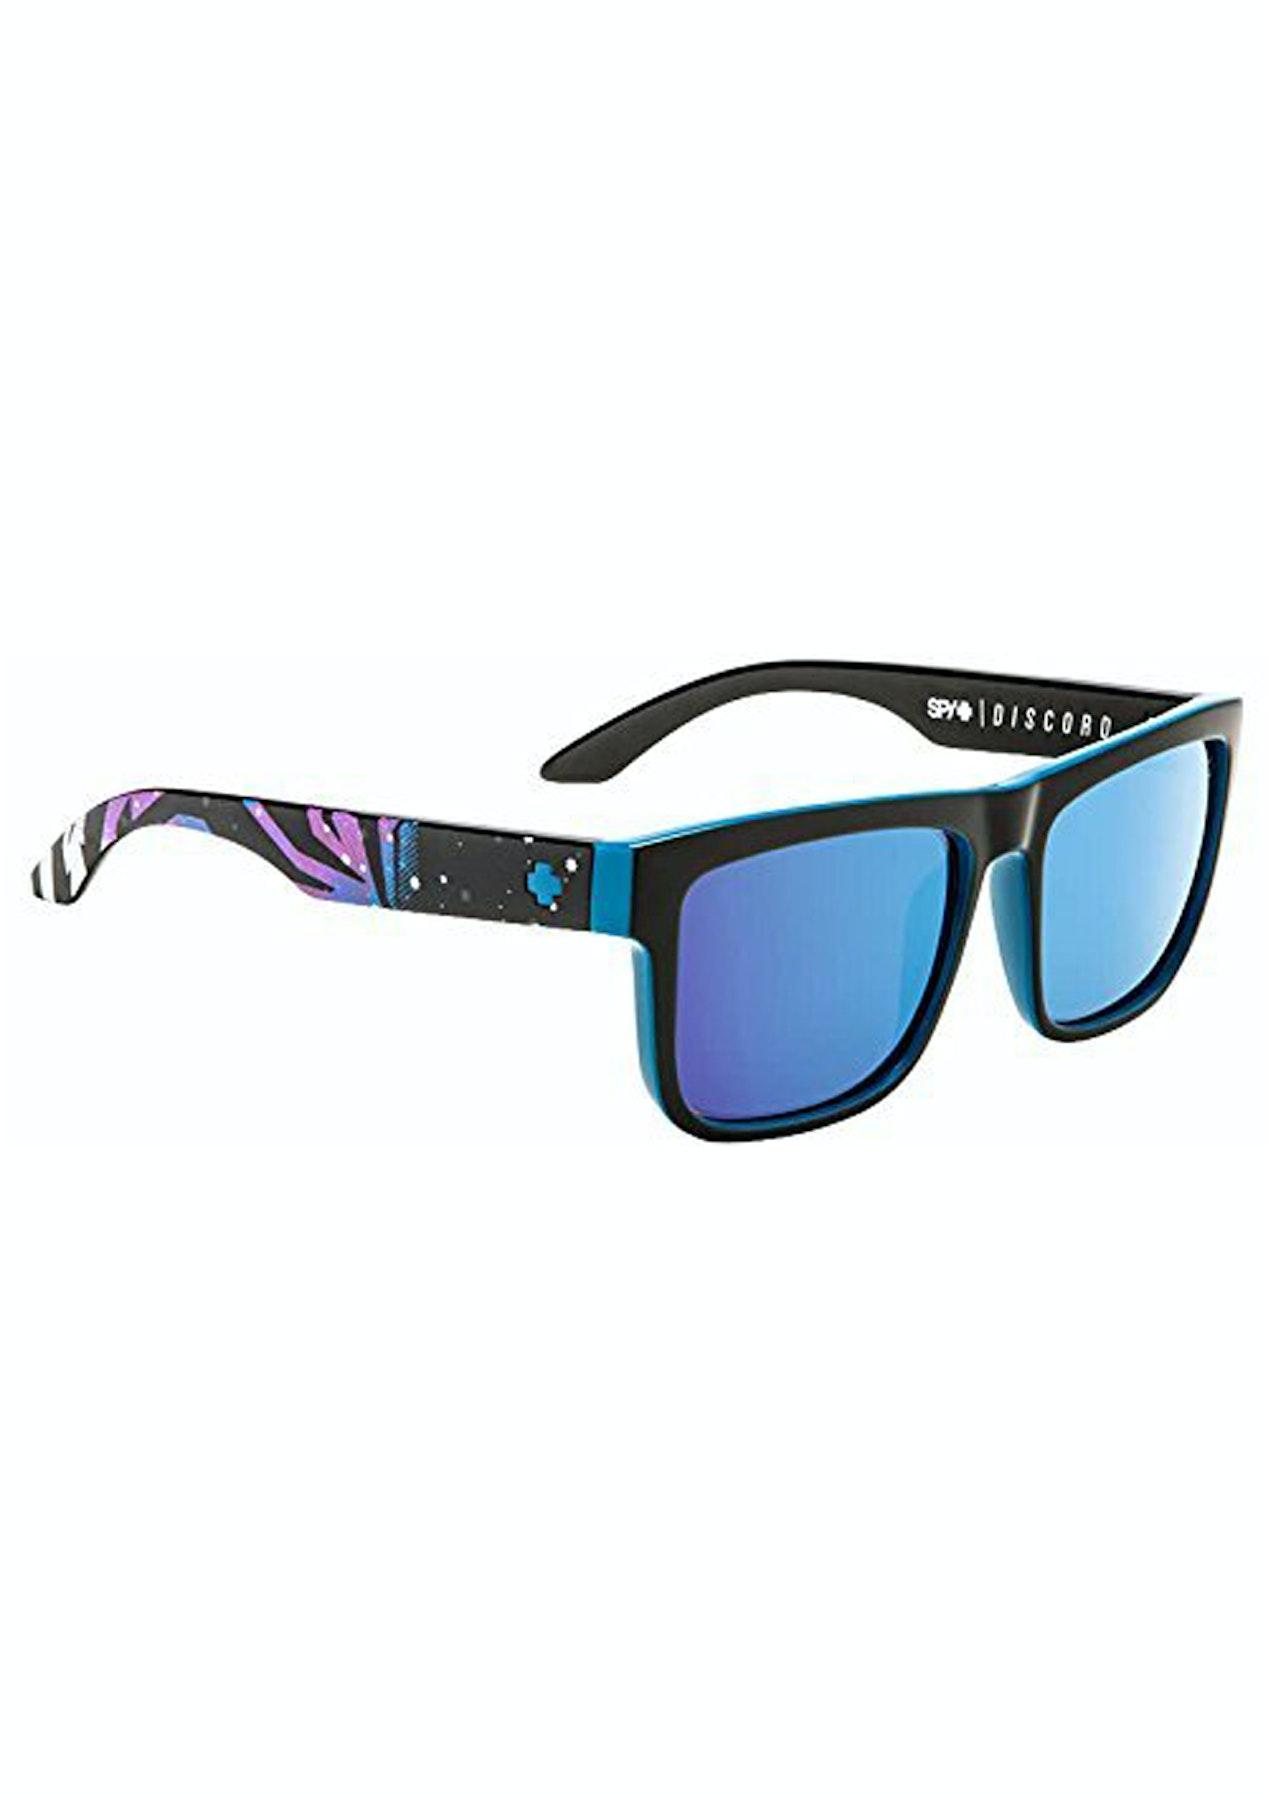 f6ee32eb4 SPY Discord Sunglasses - Ken Block 2015 - Happy Bronze w/Light Blue Spectra  - Accessories & Eyewear Warehouse - Onceit